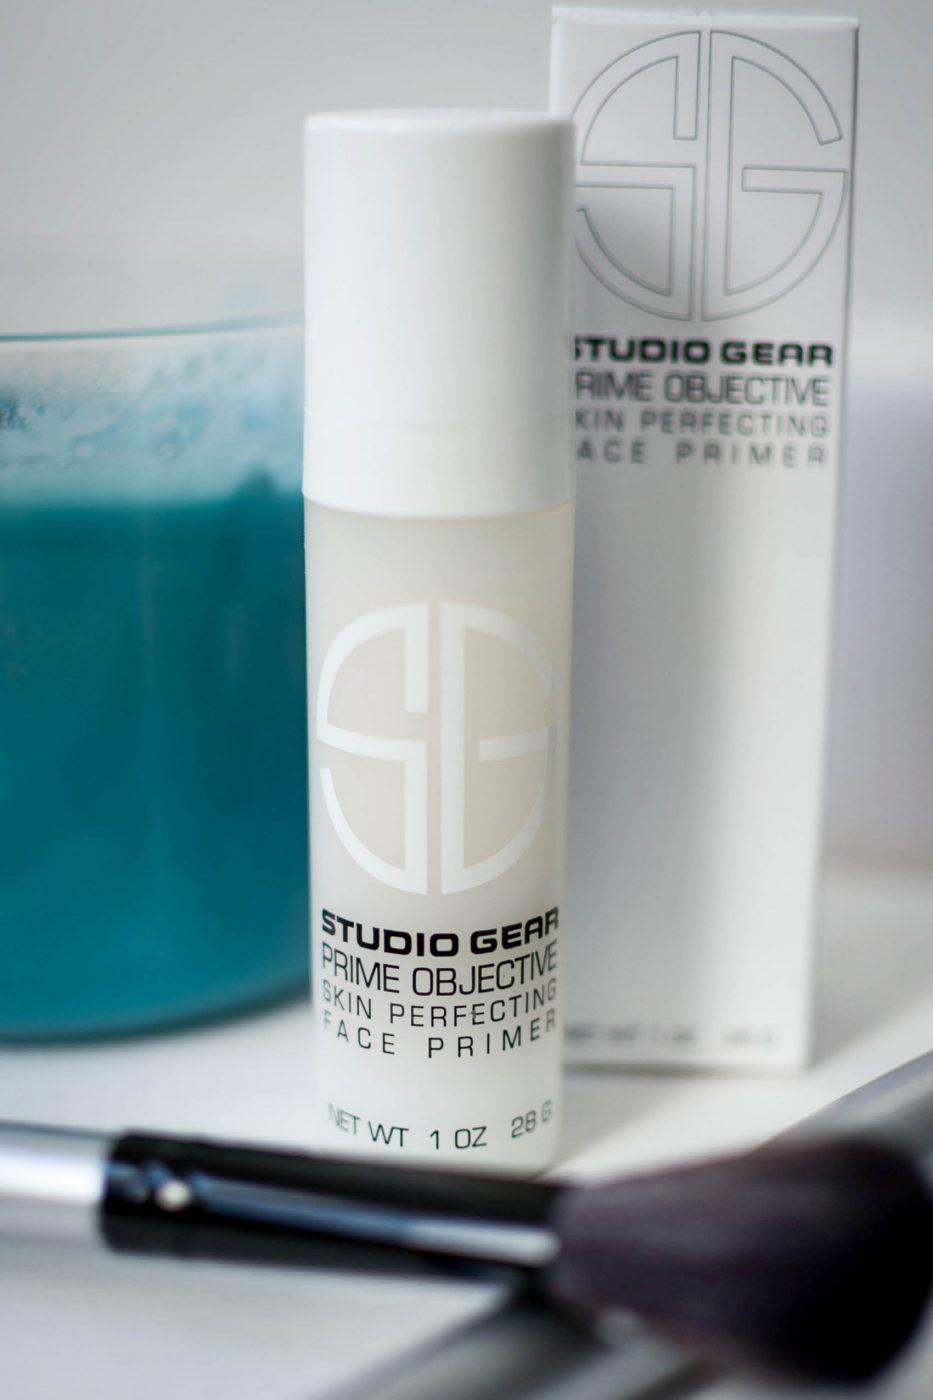 Studio Gear Primer Review